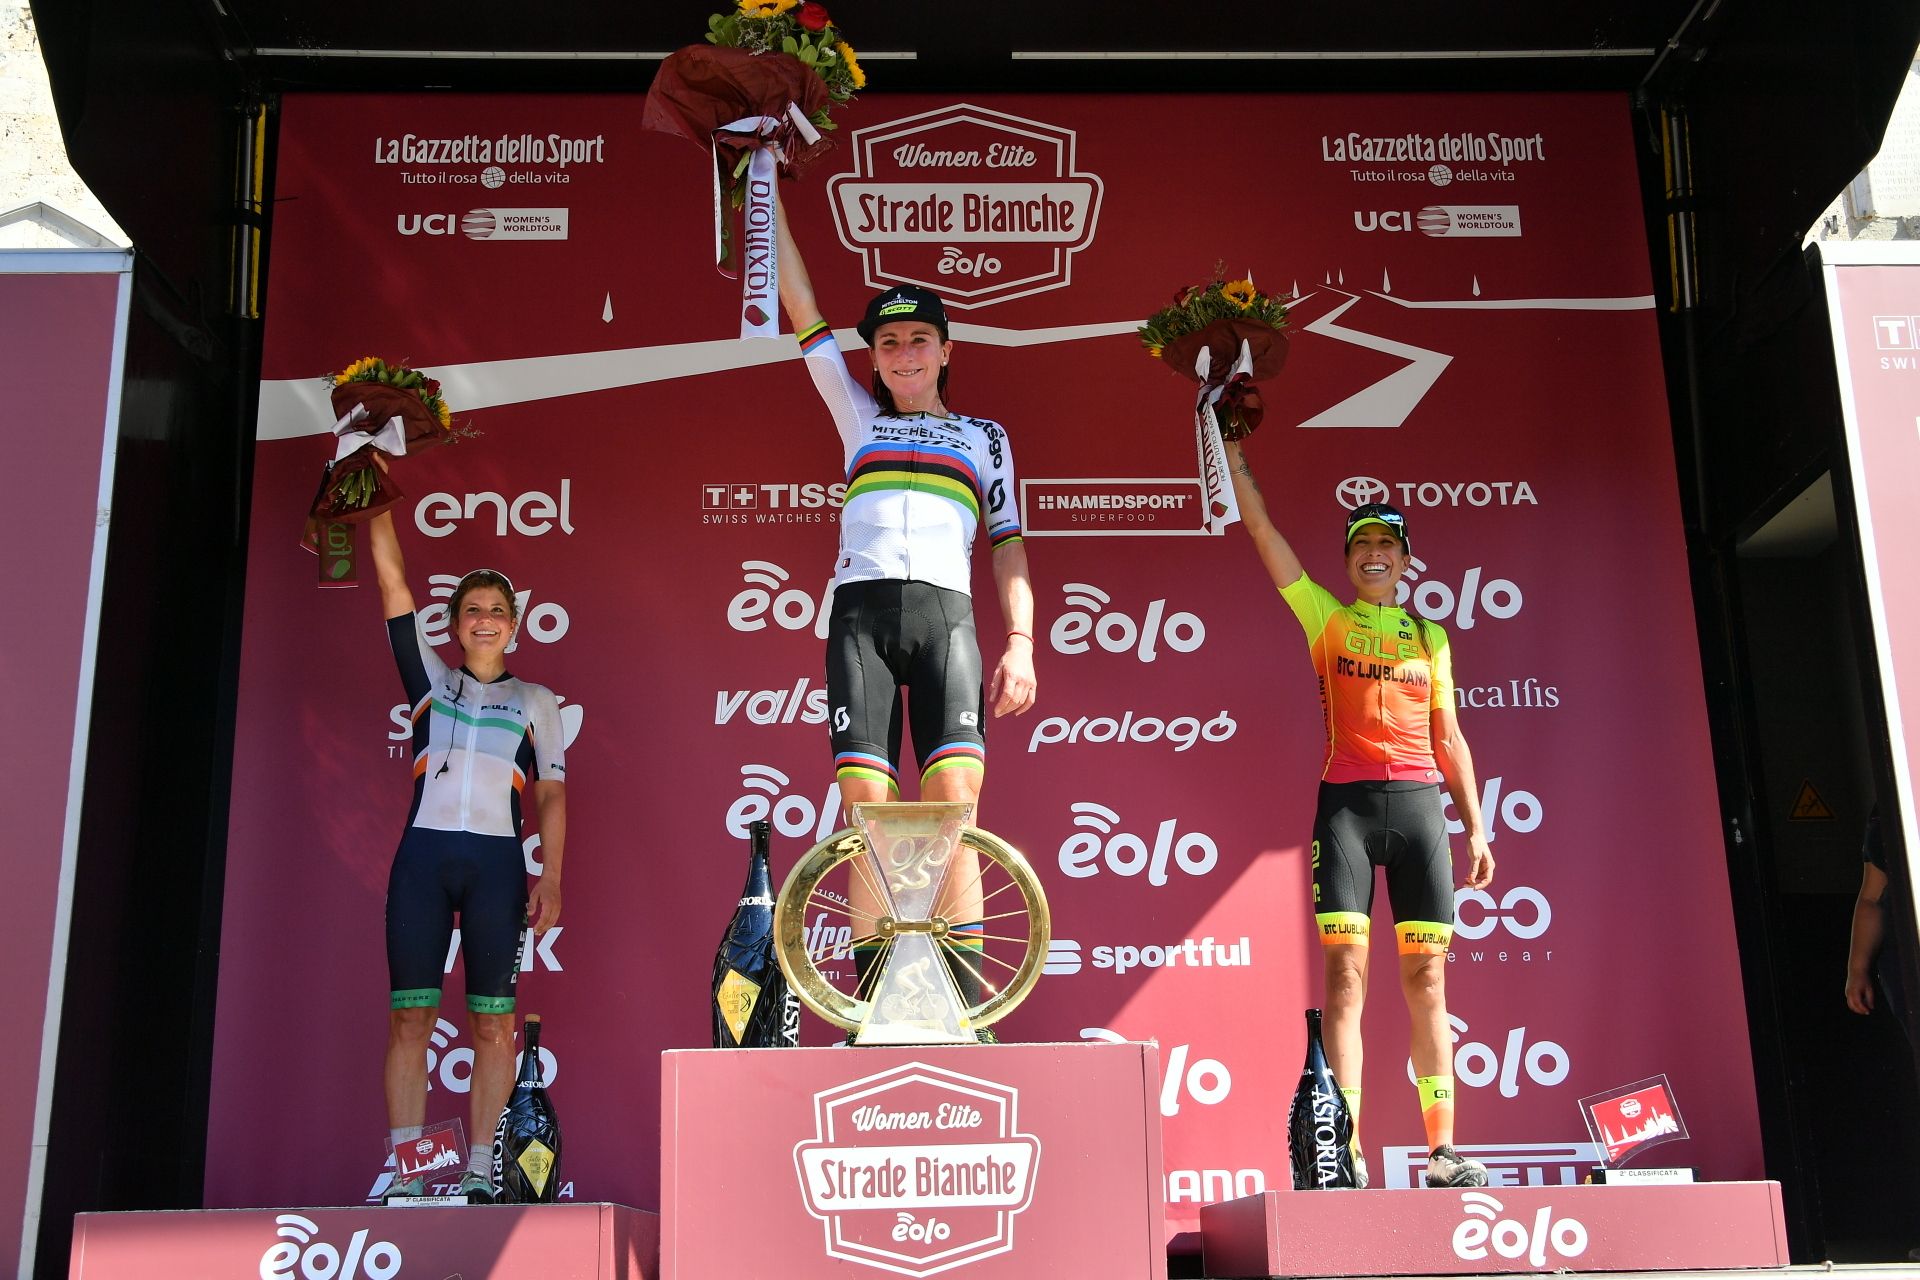 Ny sejr til verdensmester. Dansk på syvendepladsen